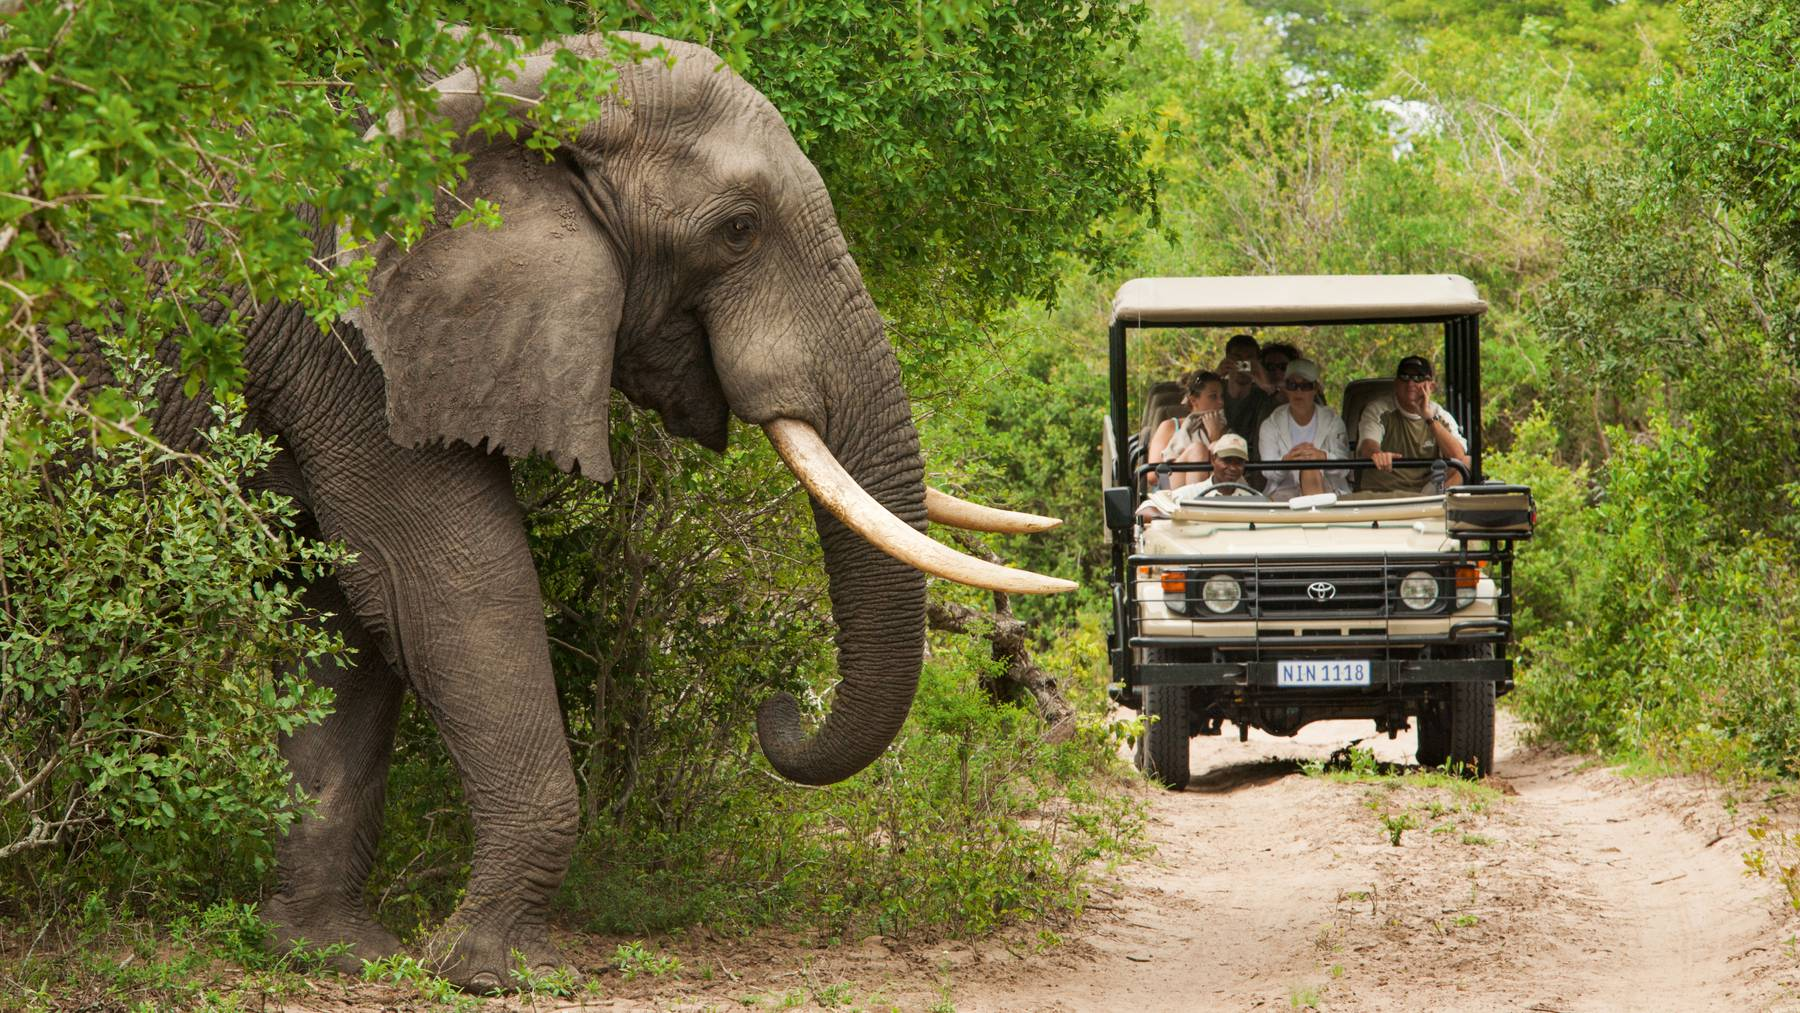 SAT_Safari_Pirschfahrt im Krueger Nationalpark 2